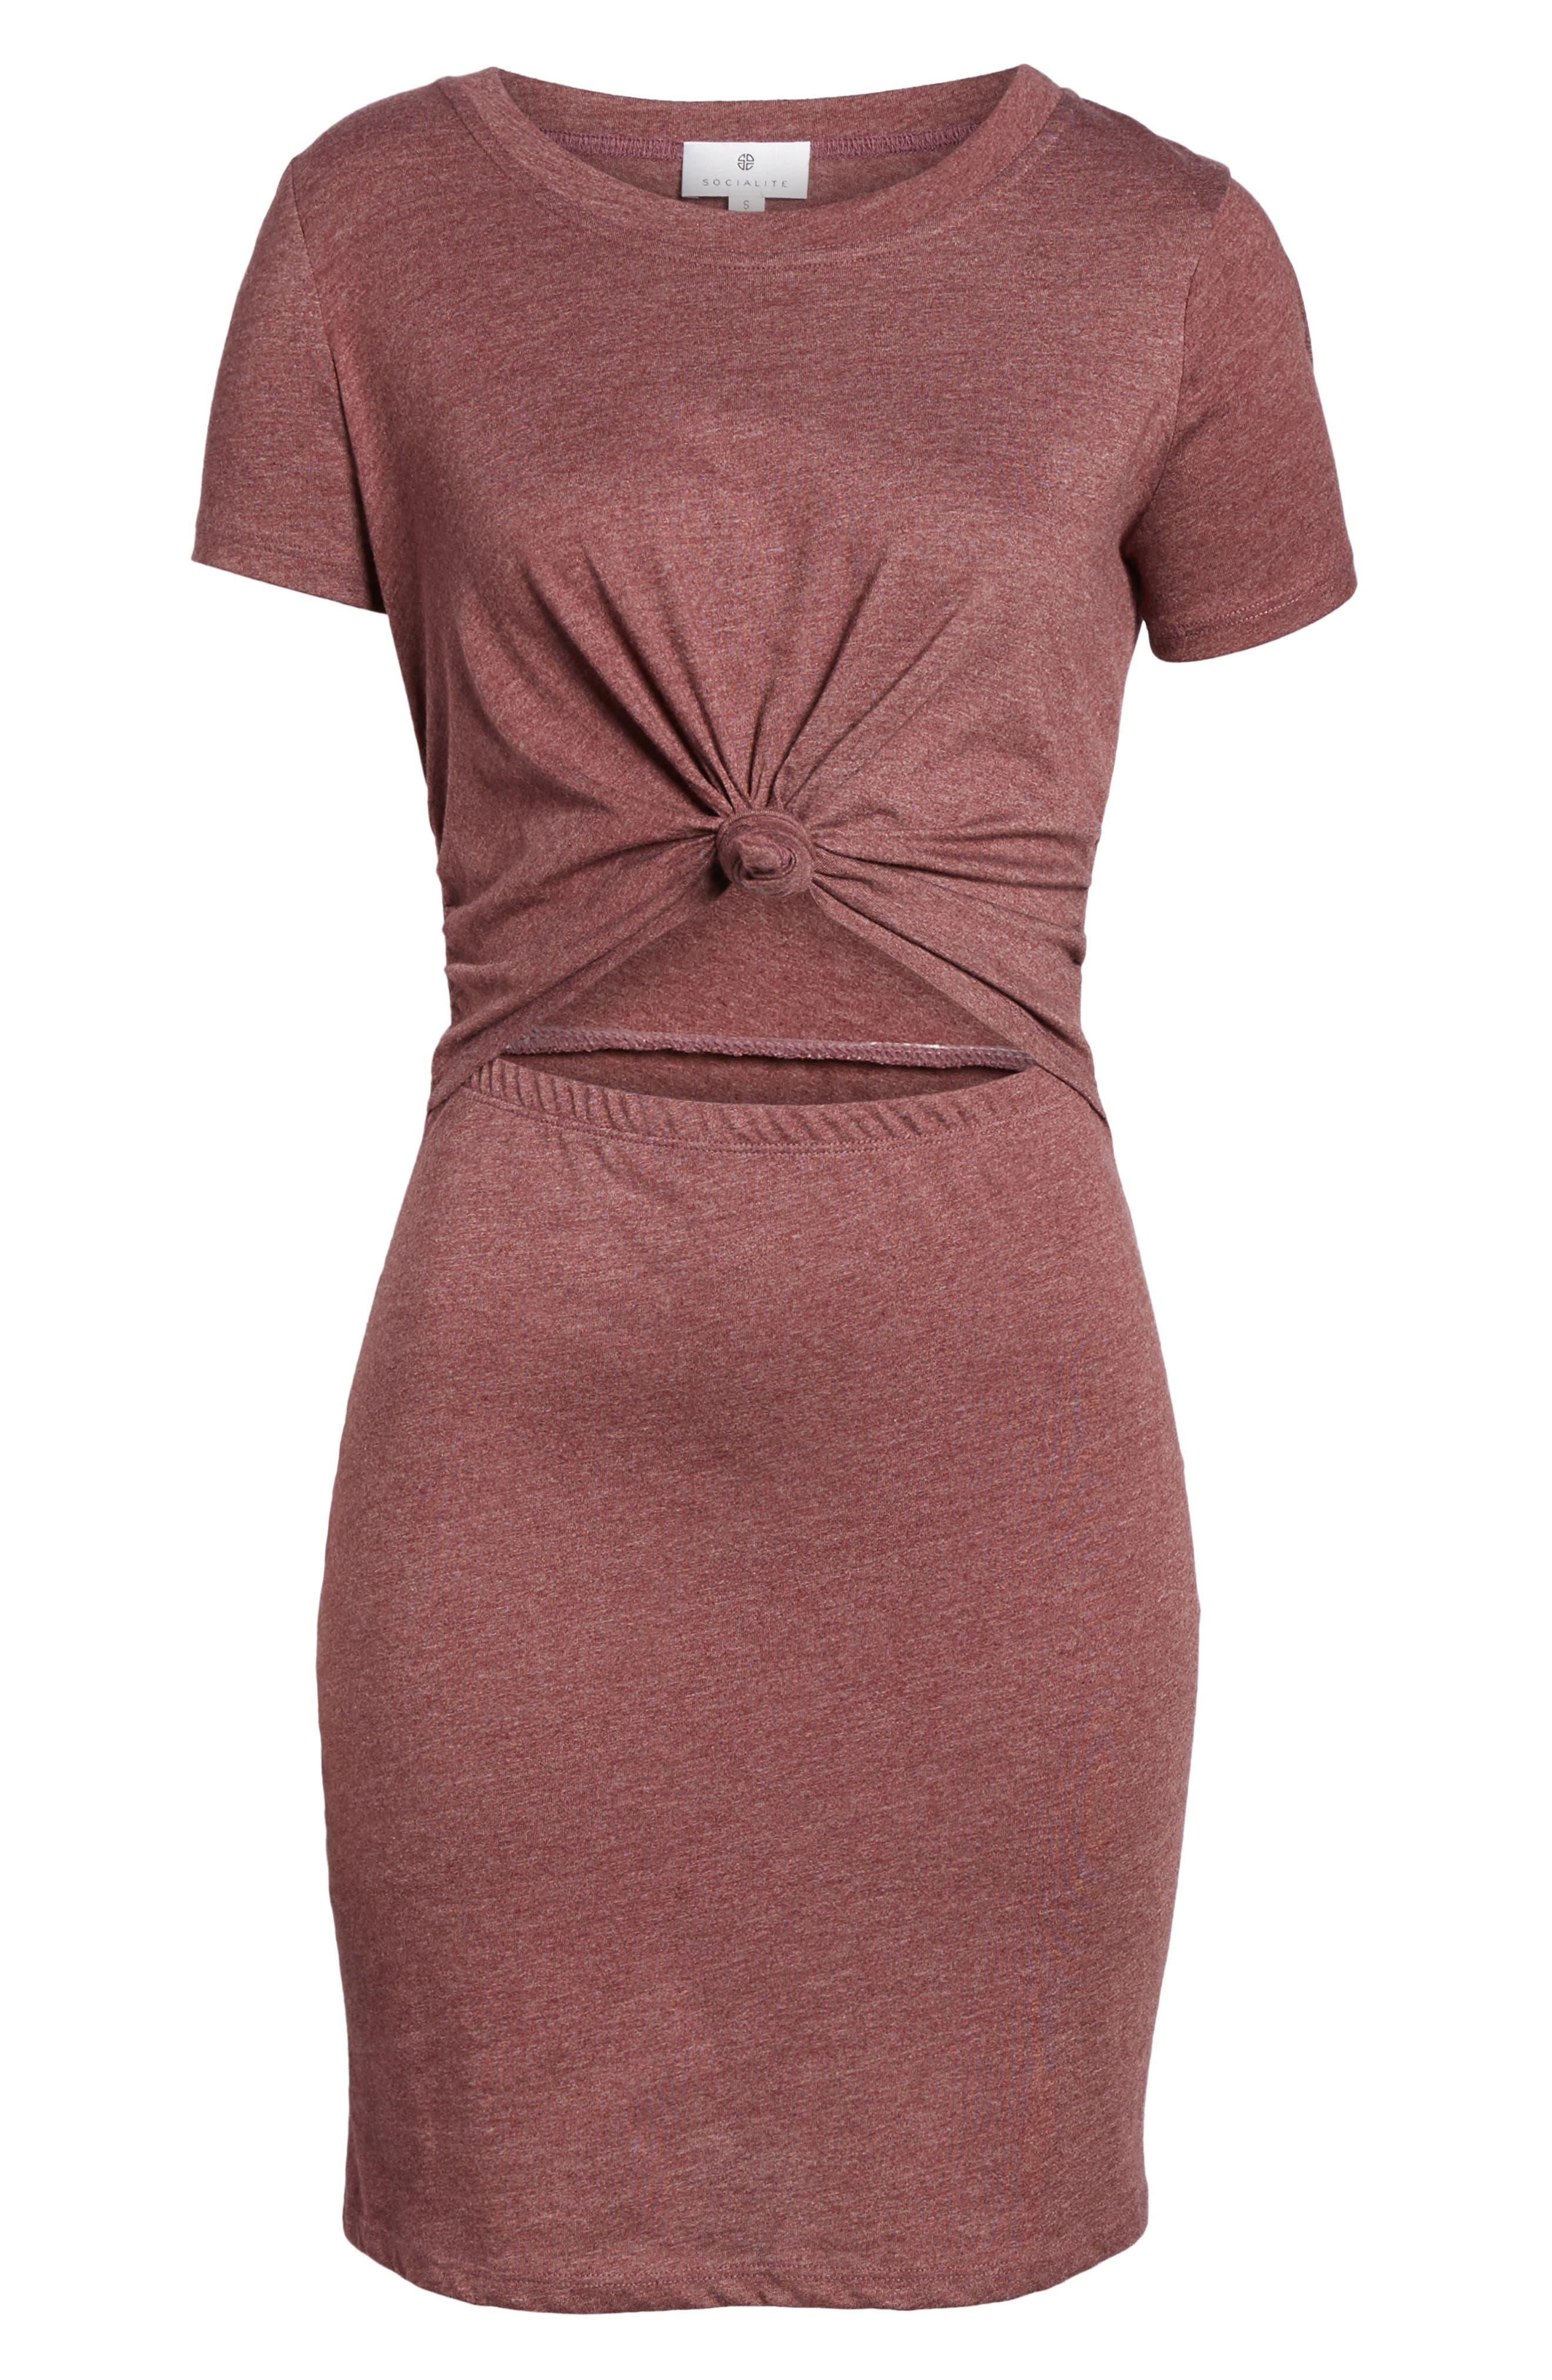 Knot Front Cutout T-Shirt Dress,                             Alternate thumbnail 6, color,                             Burgundy